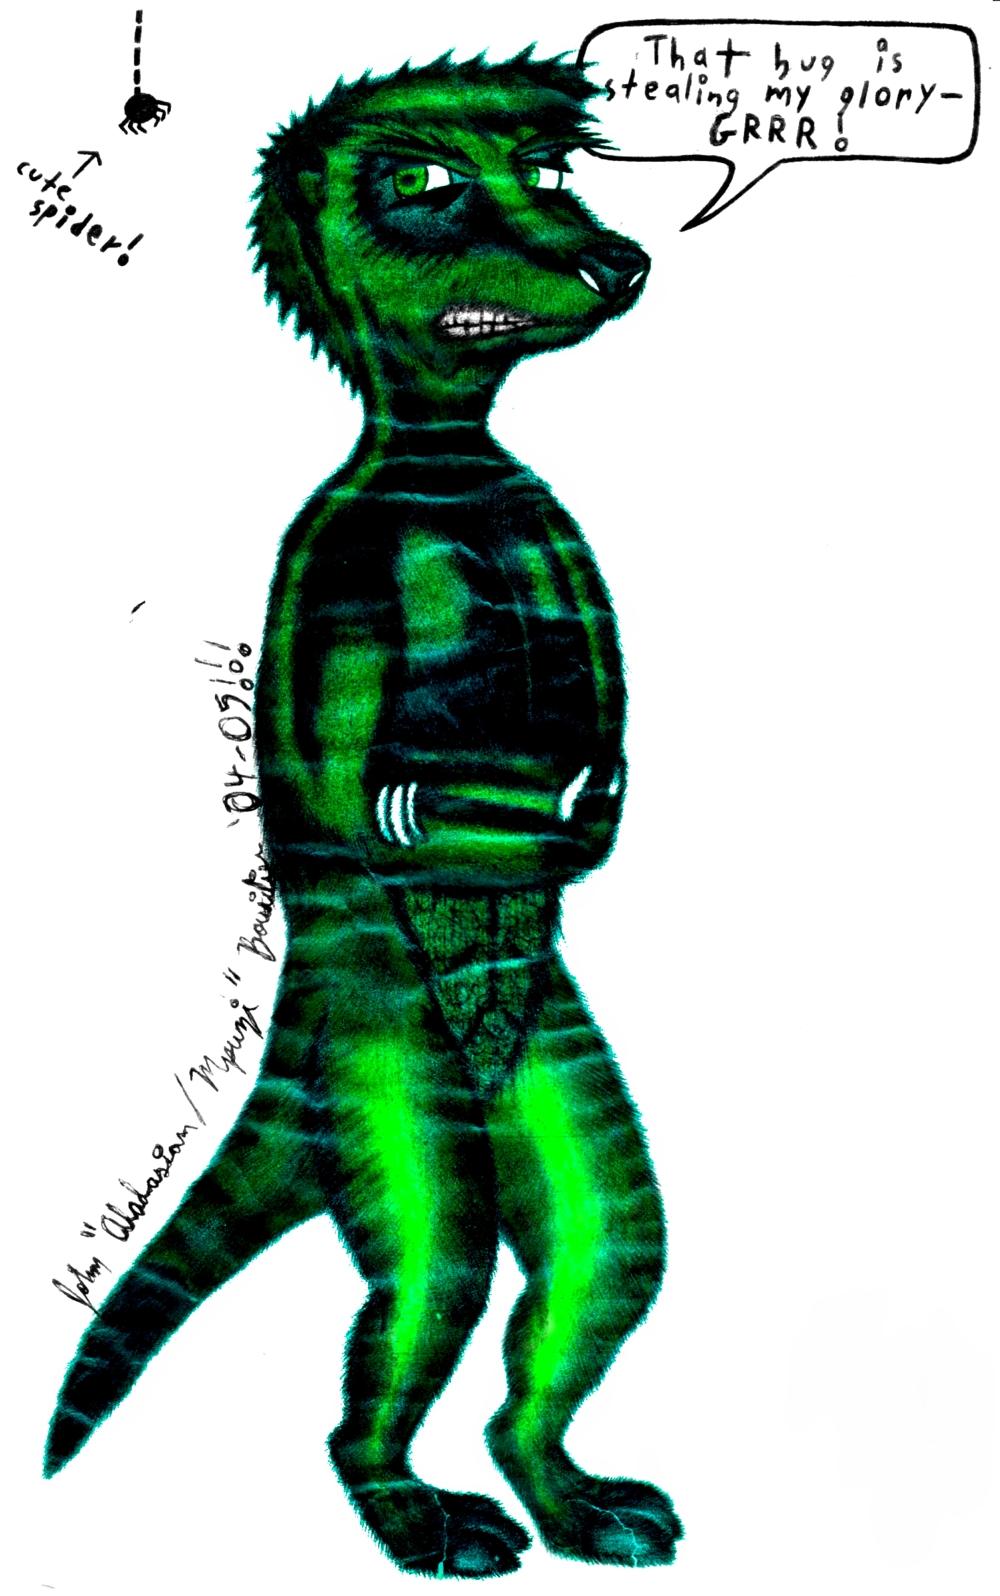 Most recent image: The Incredible Meerhulk